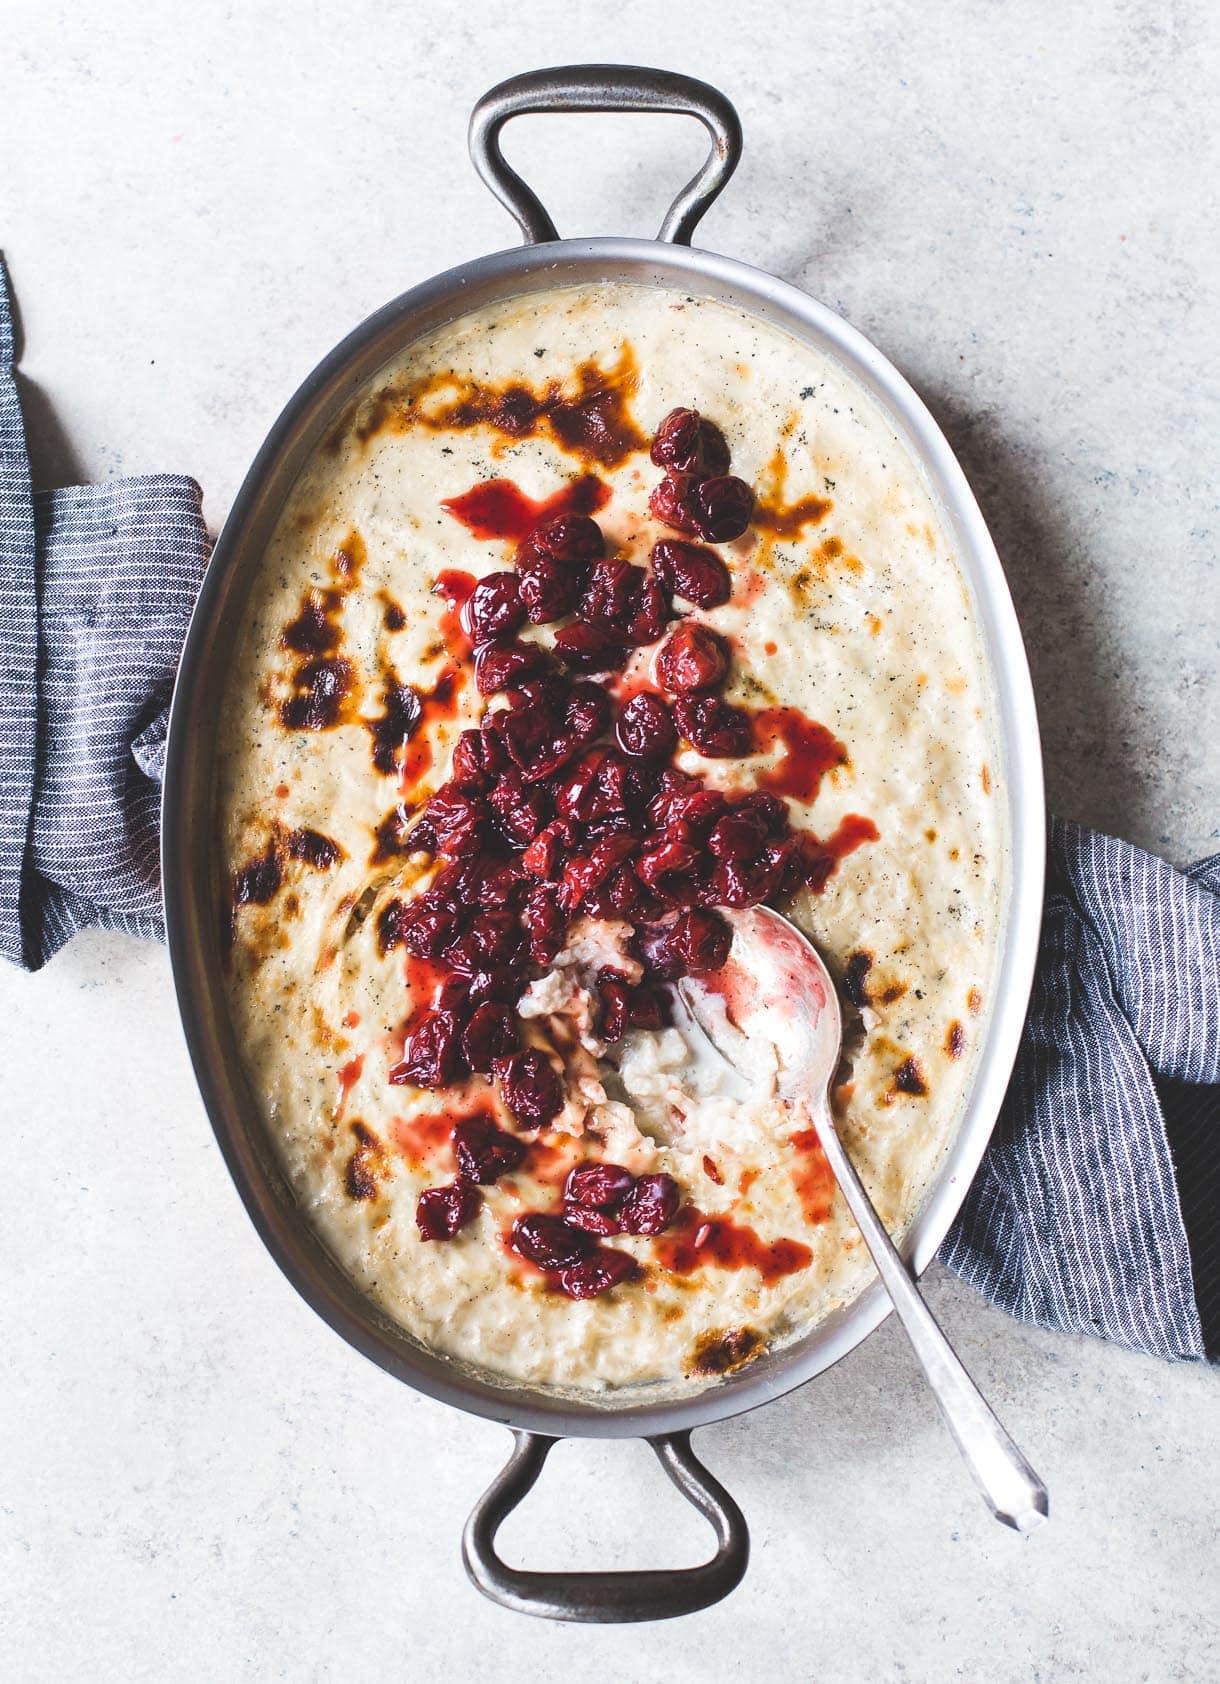 Effortless Baked Rice Pudding with Tart Cherries {gluten-free dessert}